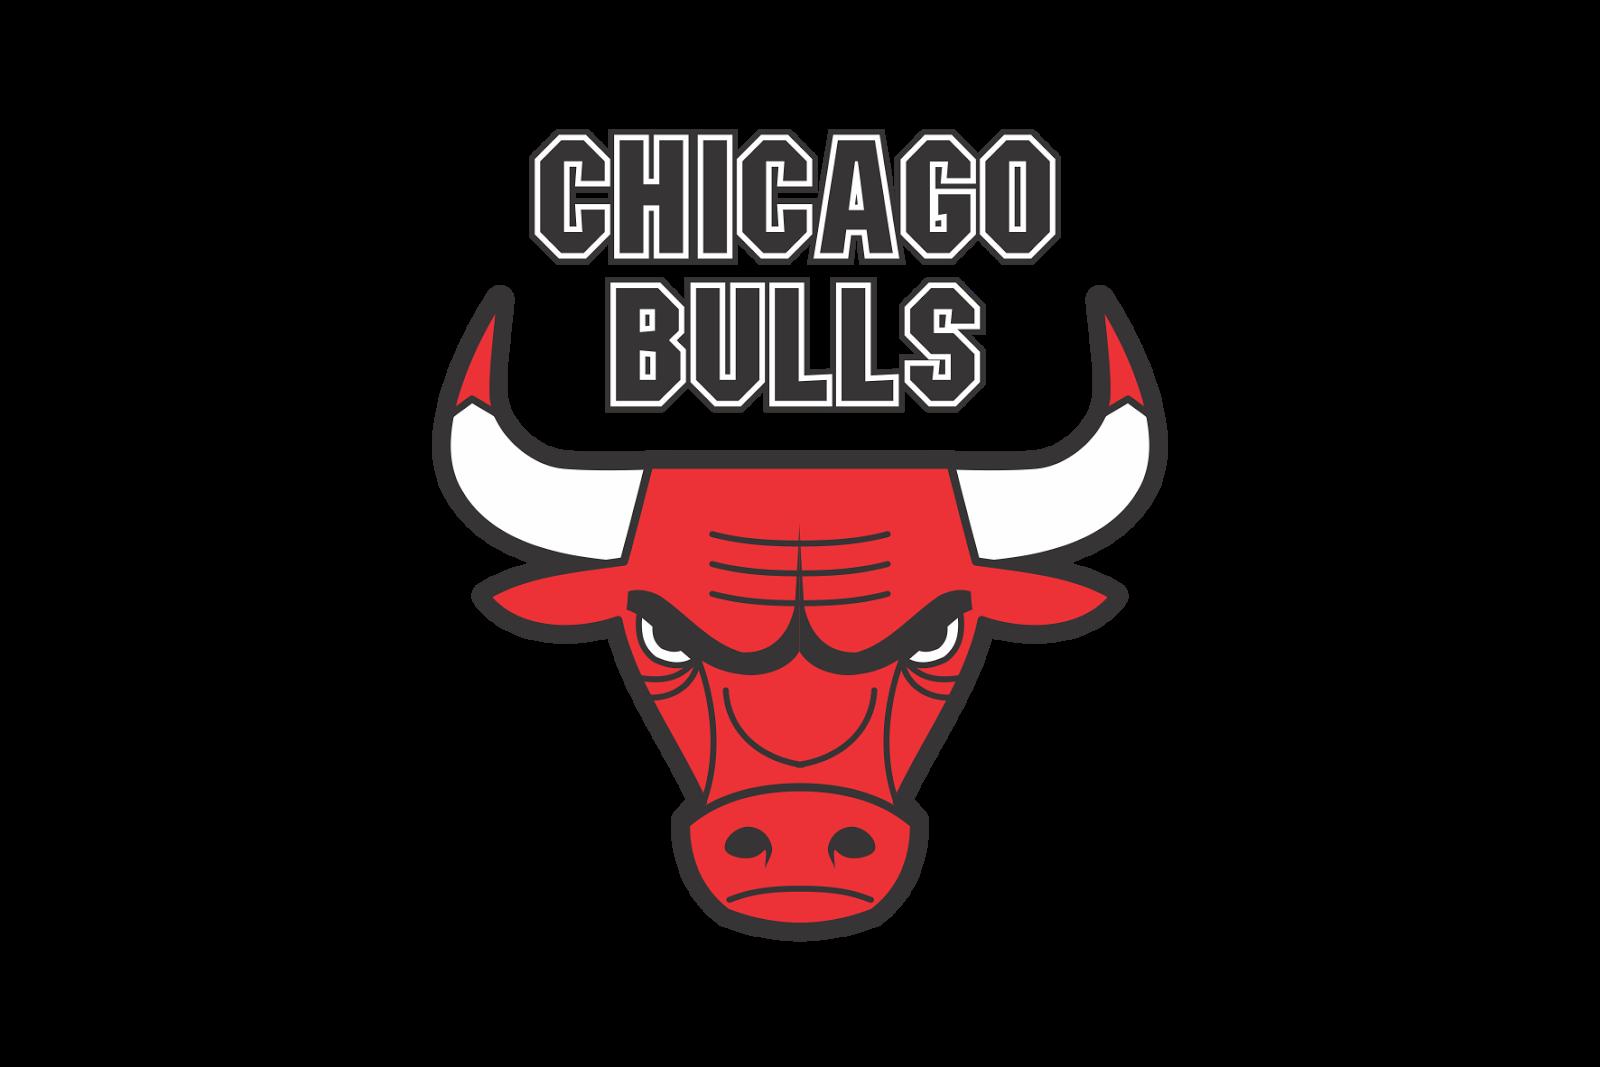 1600x1067 15 Chicago Bulls Logo Png For Free Download On Mbtskoudsalg